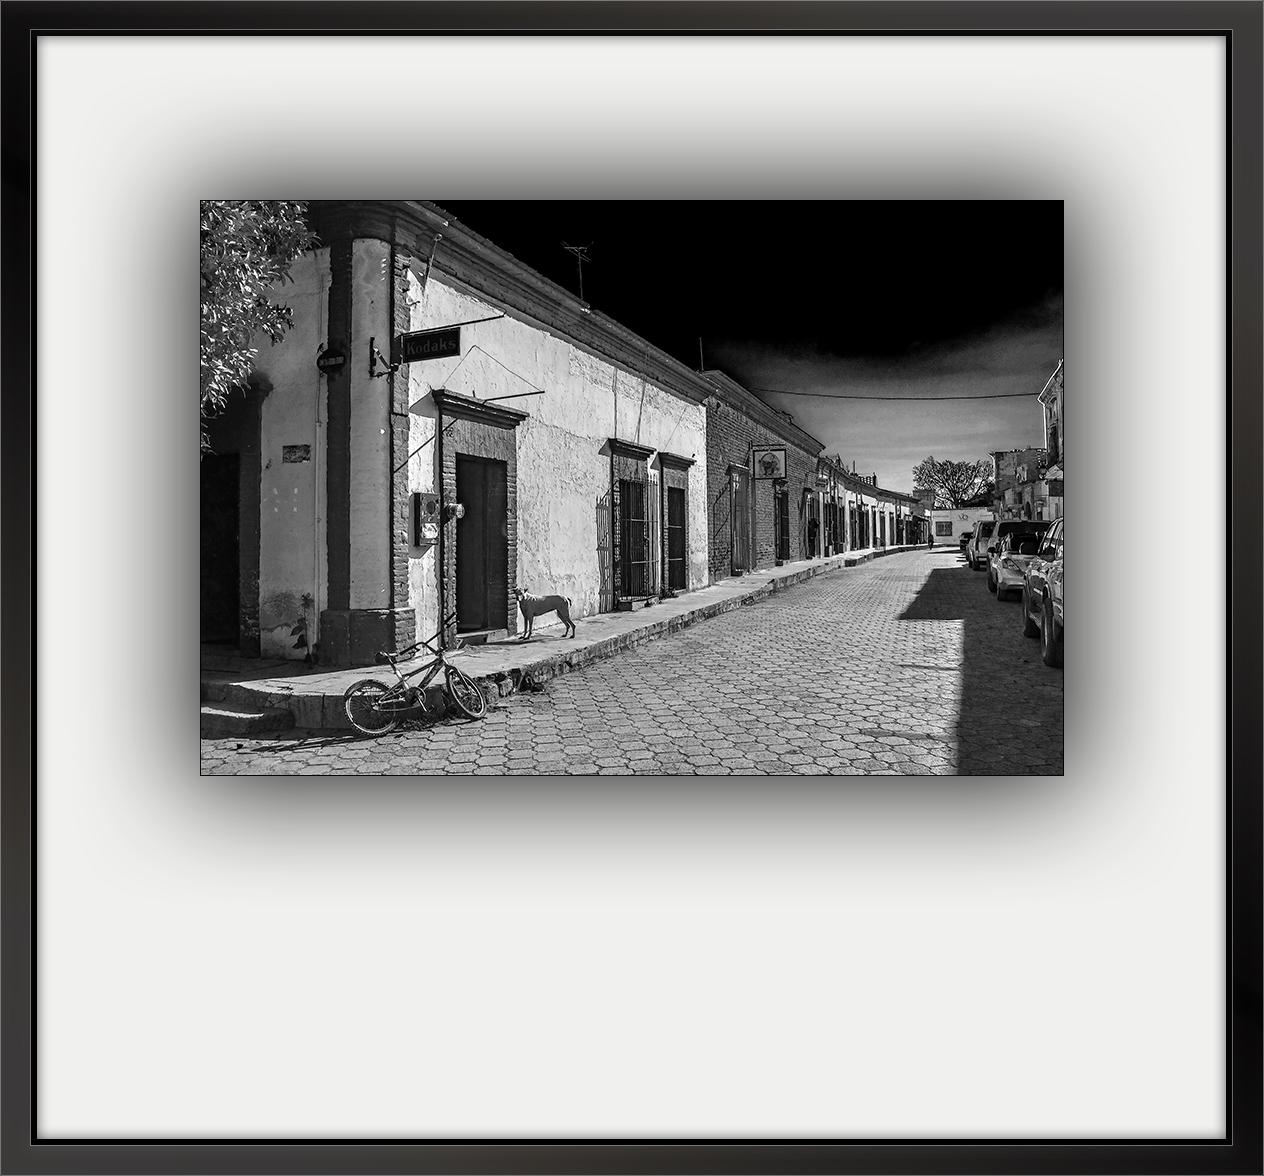 Alamos Street (1 of 1) B&W blog.jpg